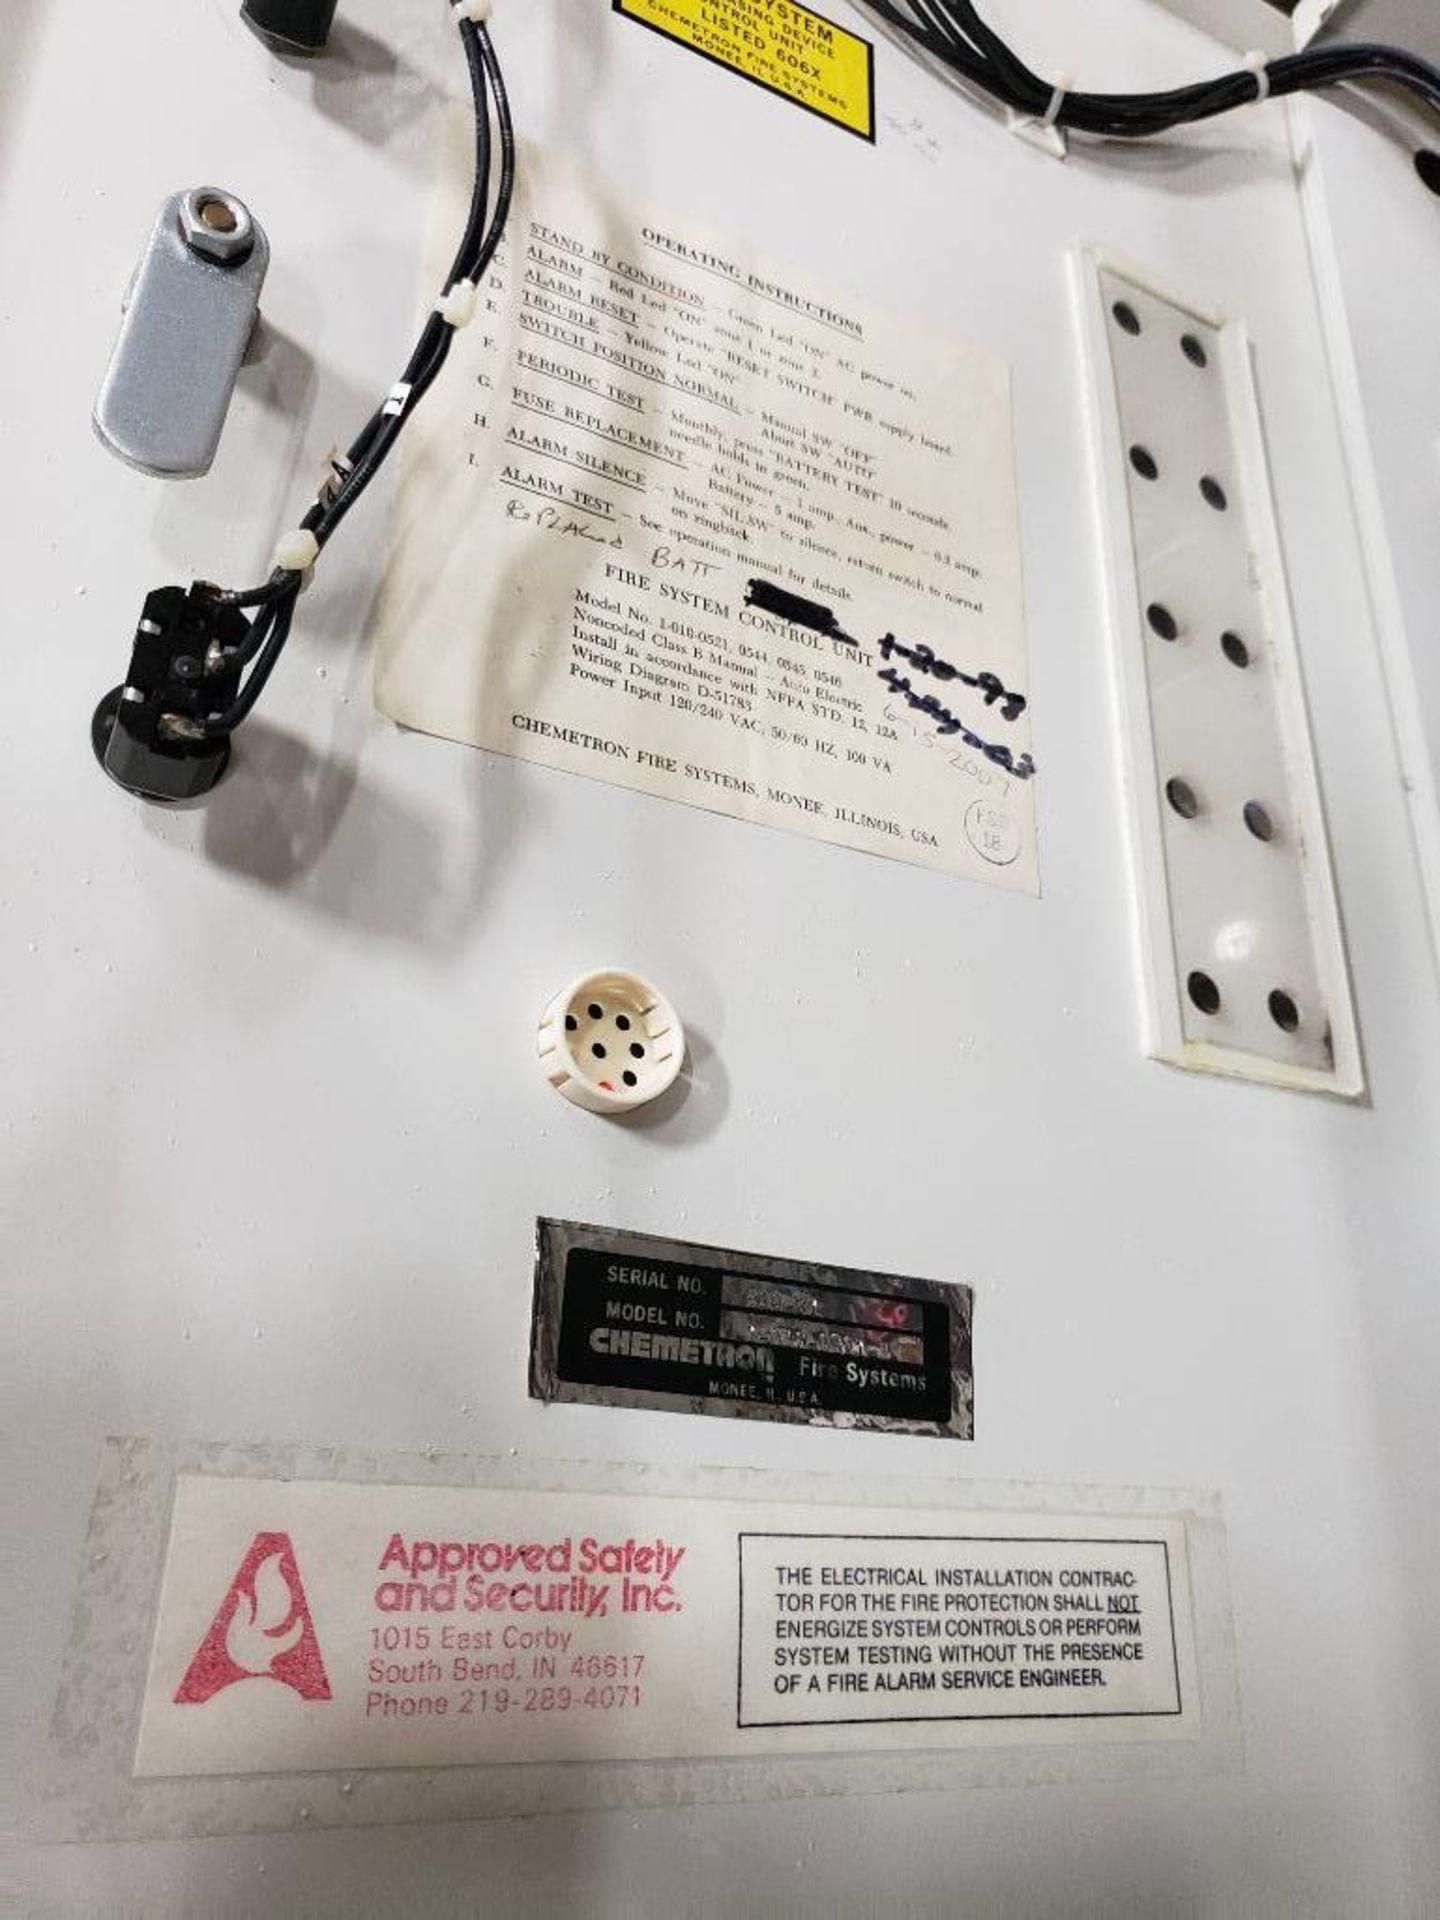 Chemetron Fire System control unit 1-010-0521-3. - Image 13 of 14